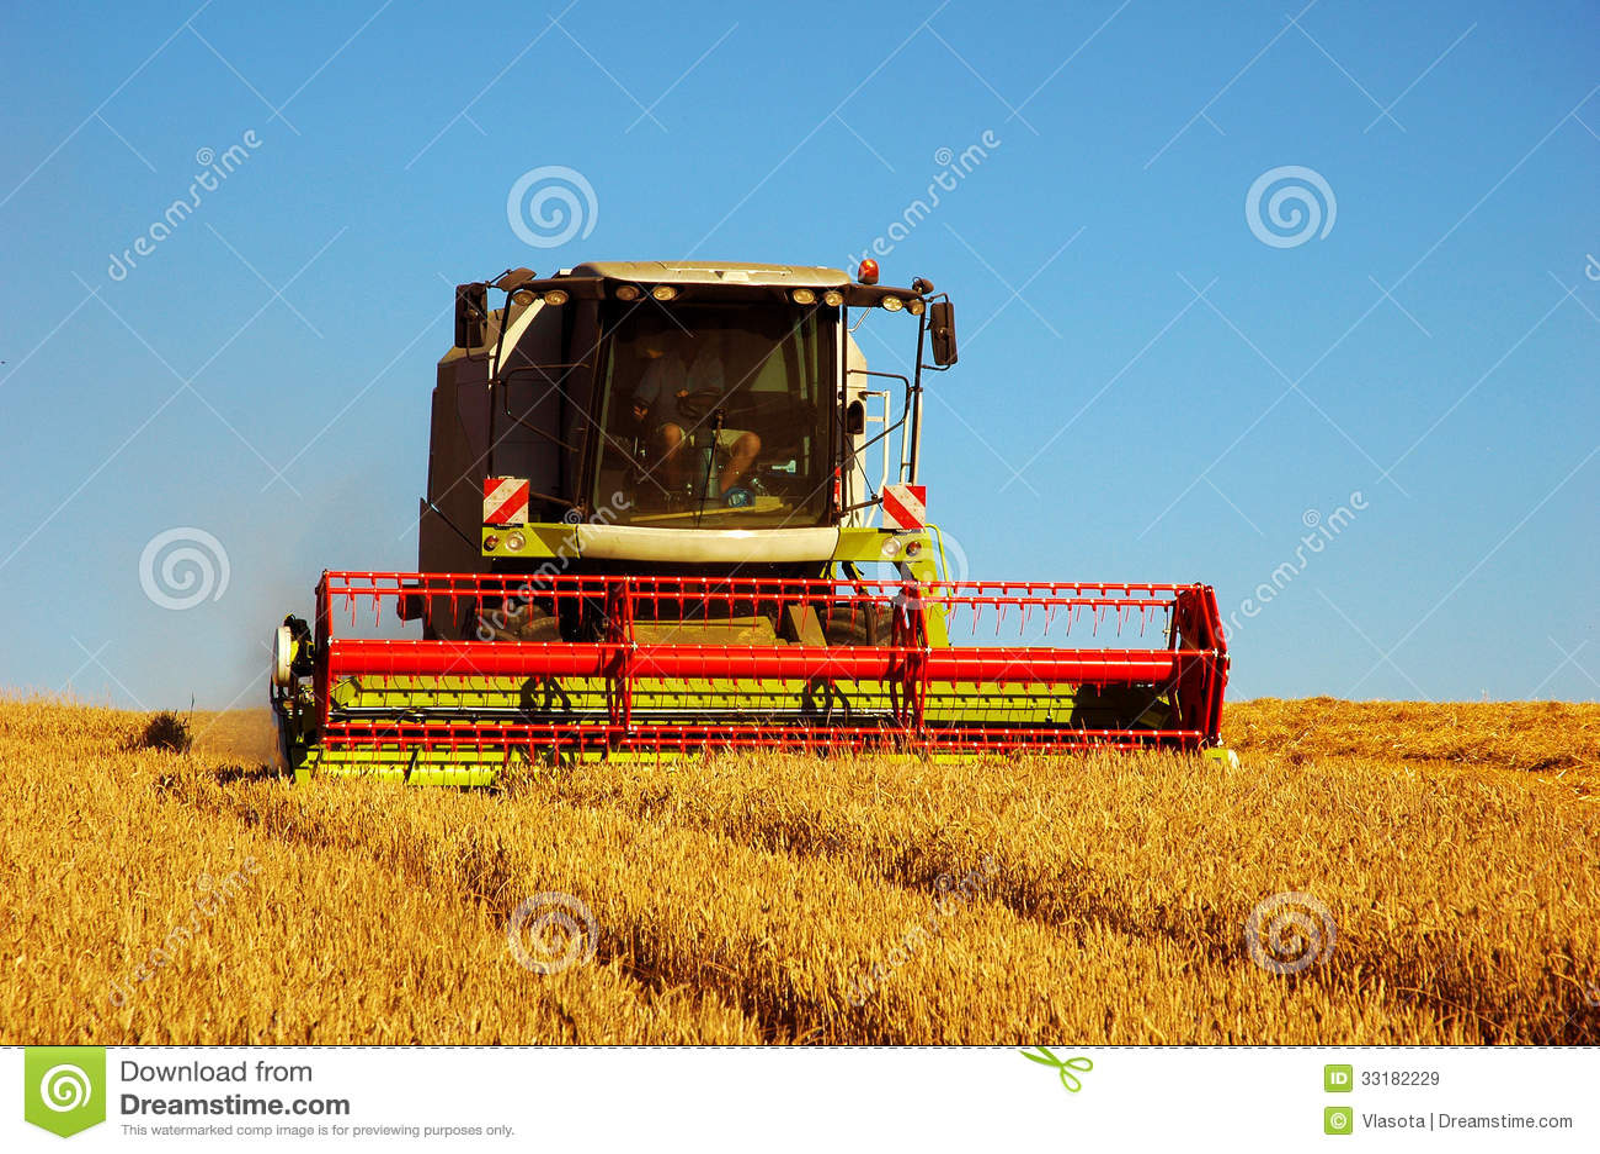 combine harvester stock image  image of farm  equipement